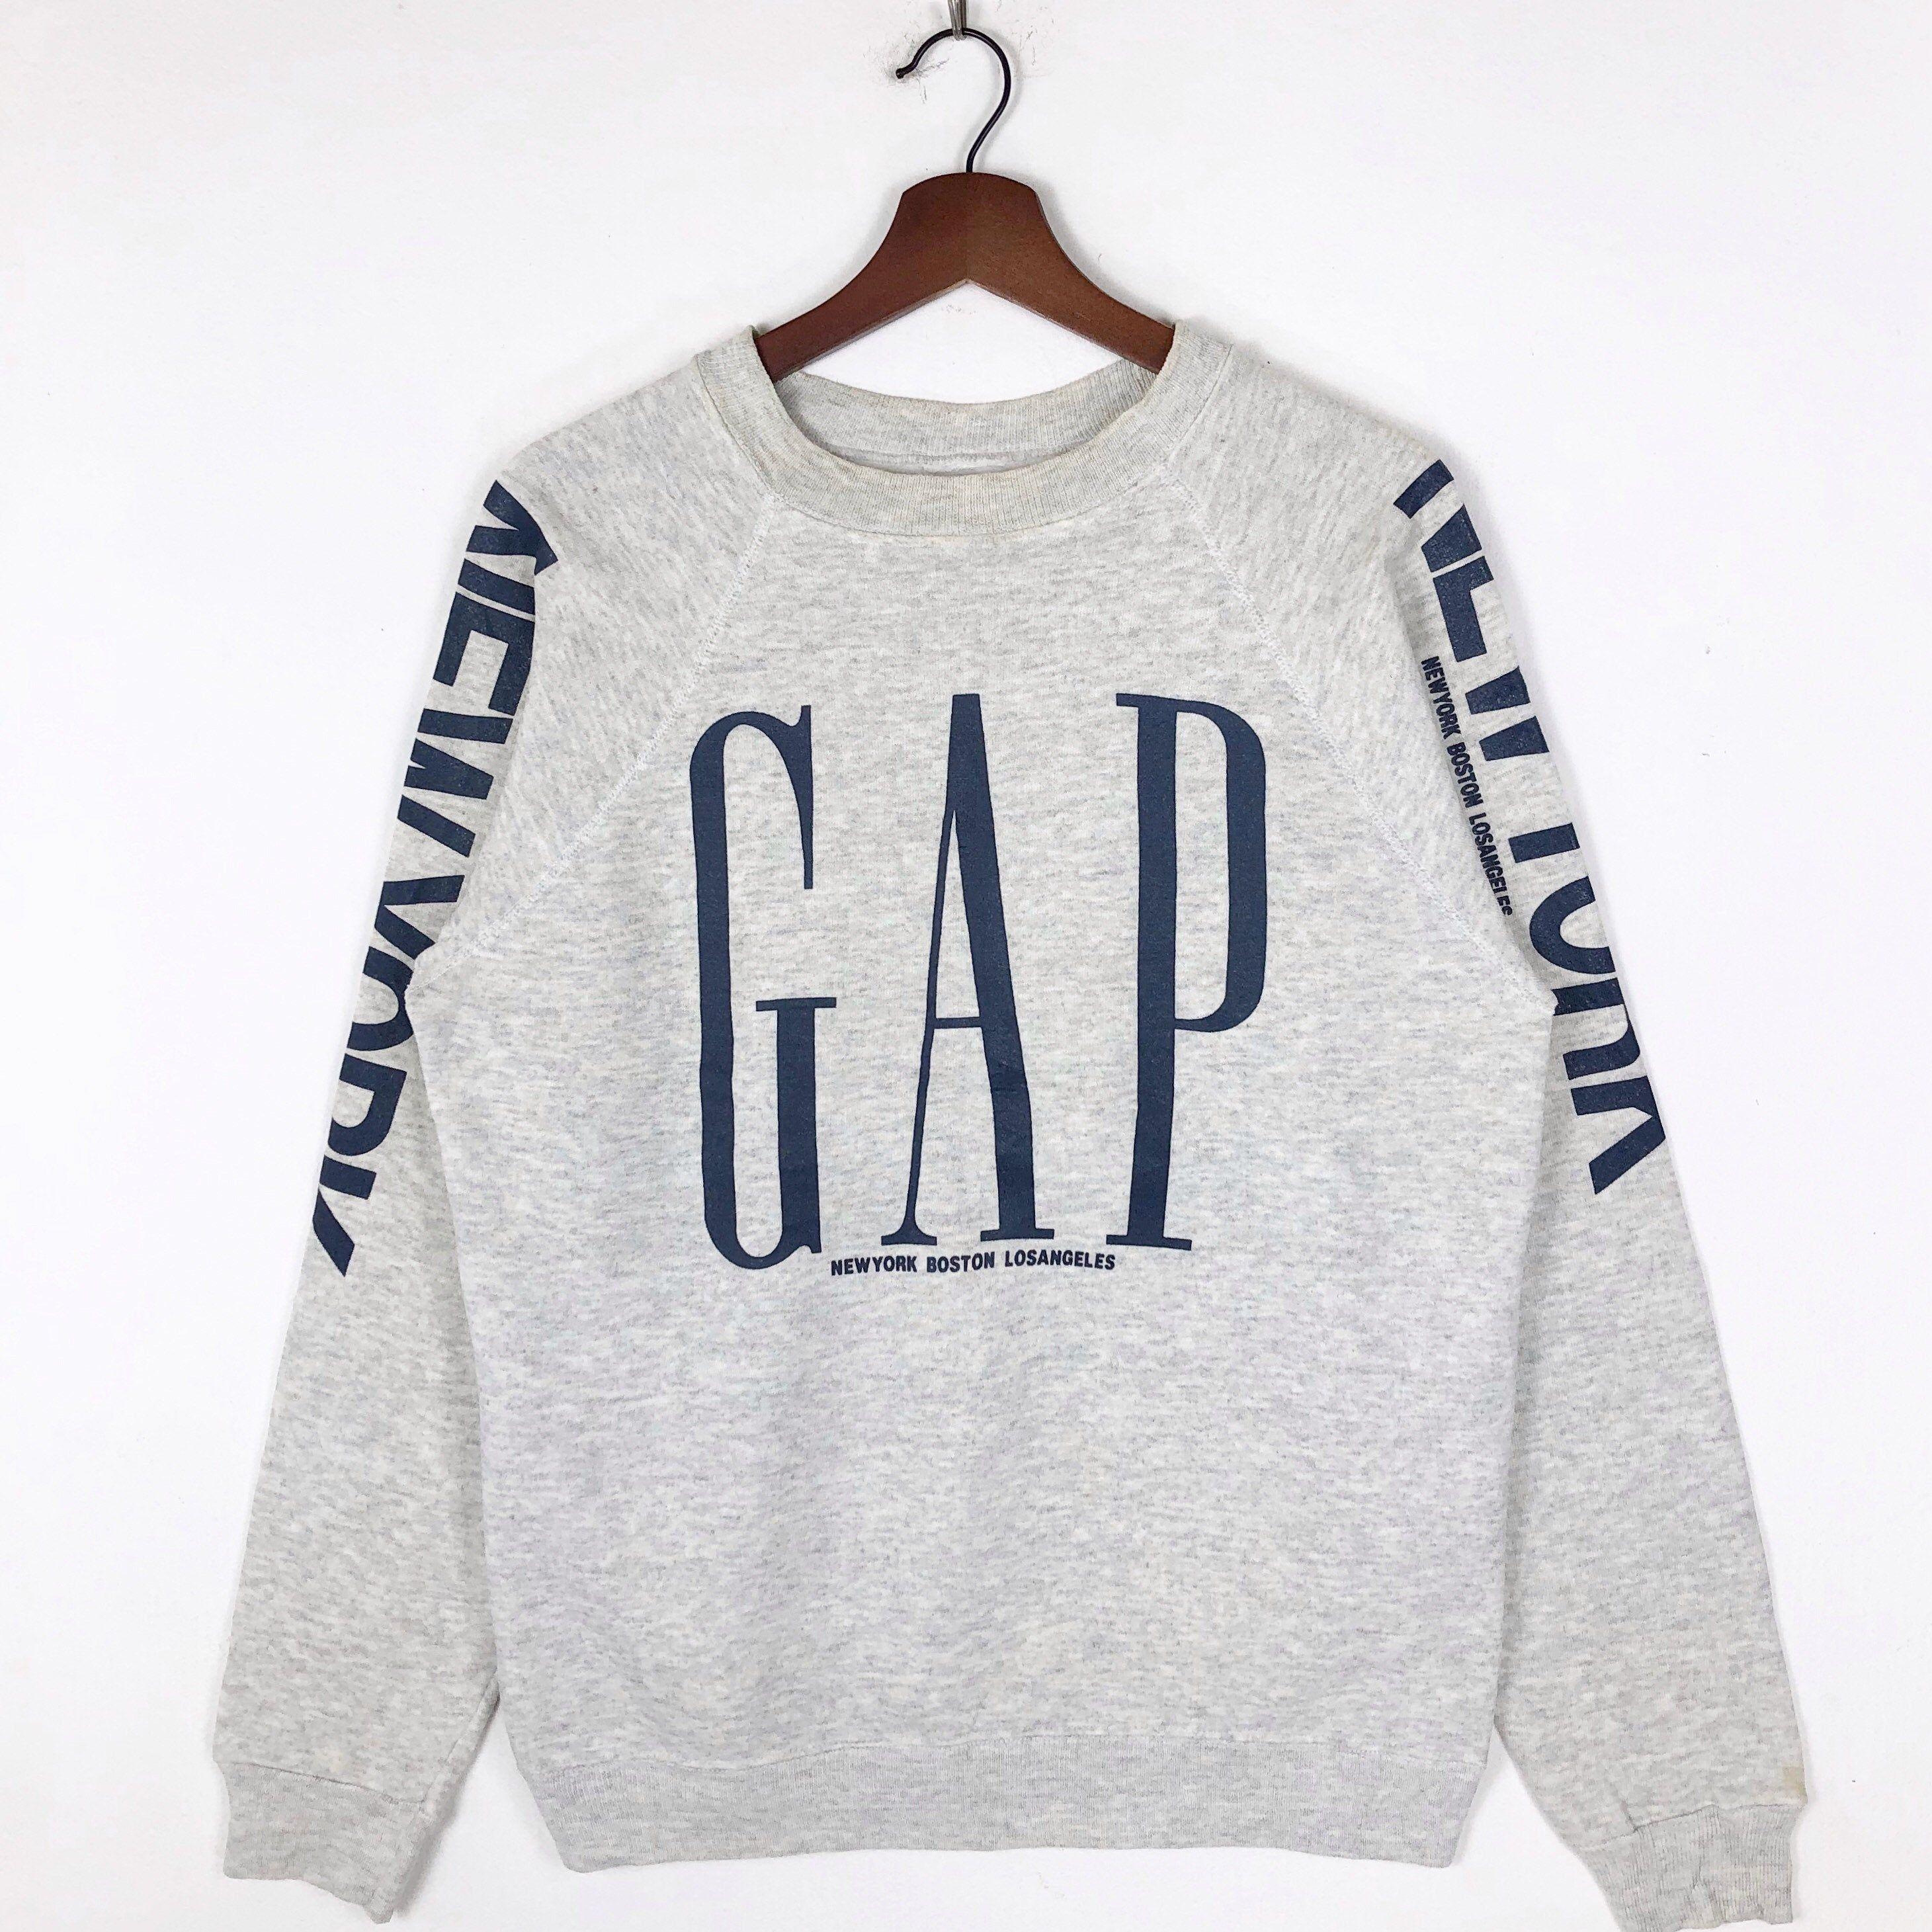 This Item Is Unavailable Etsy Sweatshirts Gap Sweatshirt Vintage Sweatshirt [ 2921 x 2921 Pixel ]